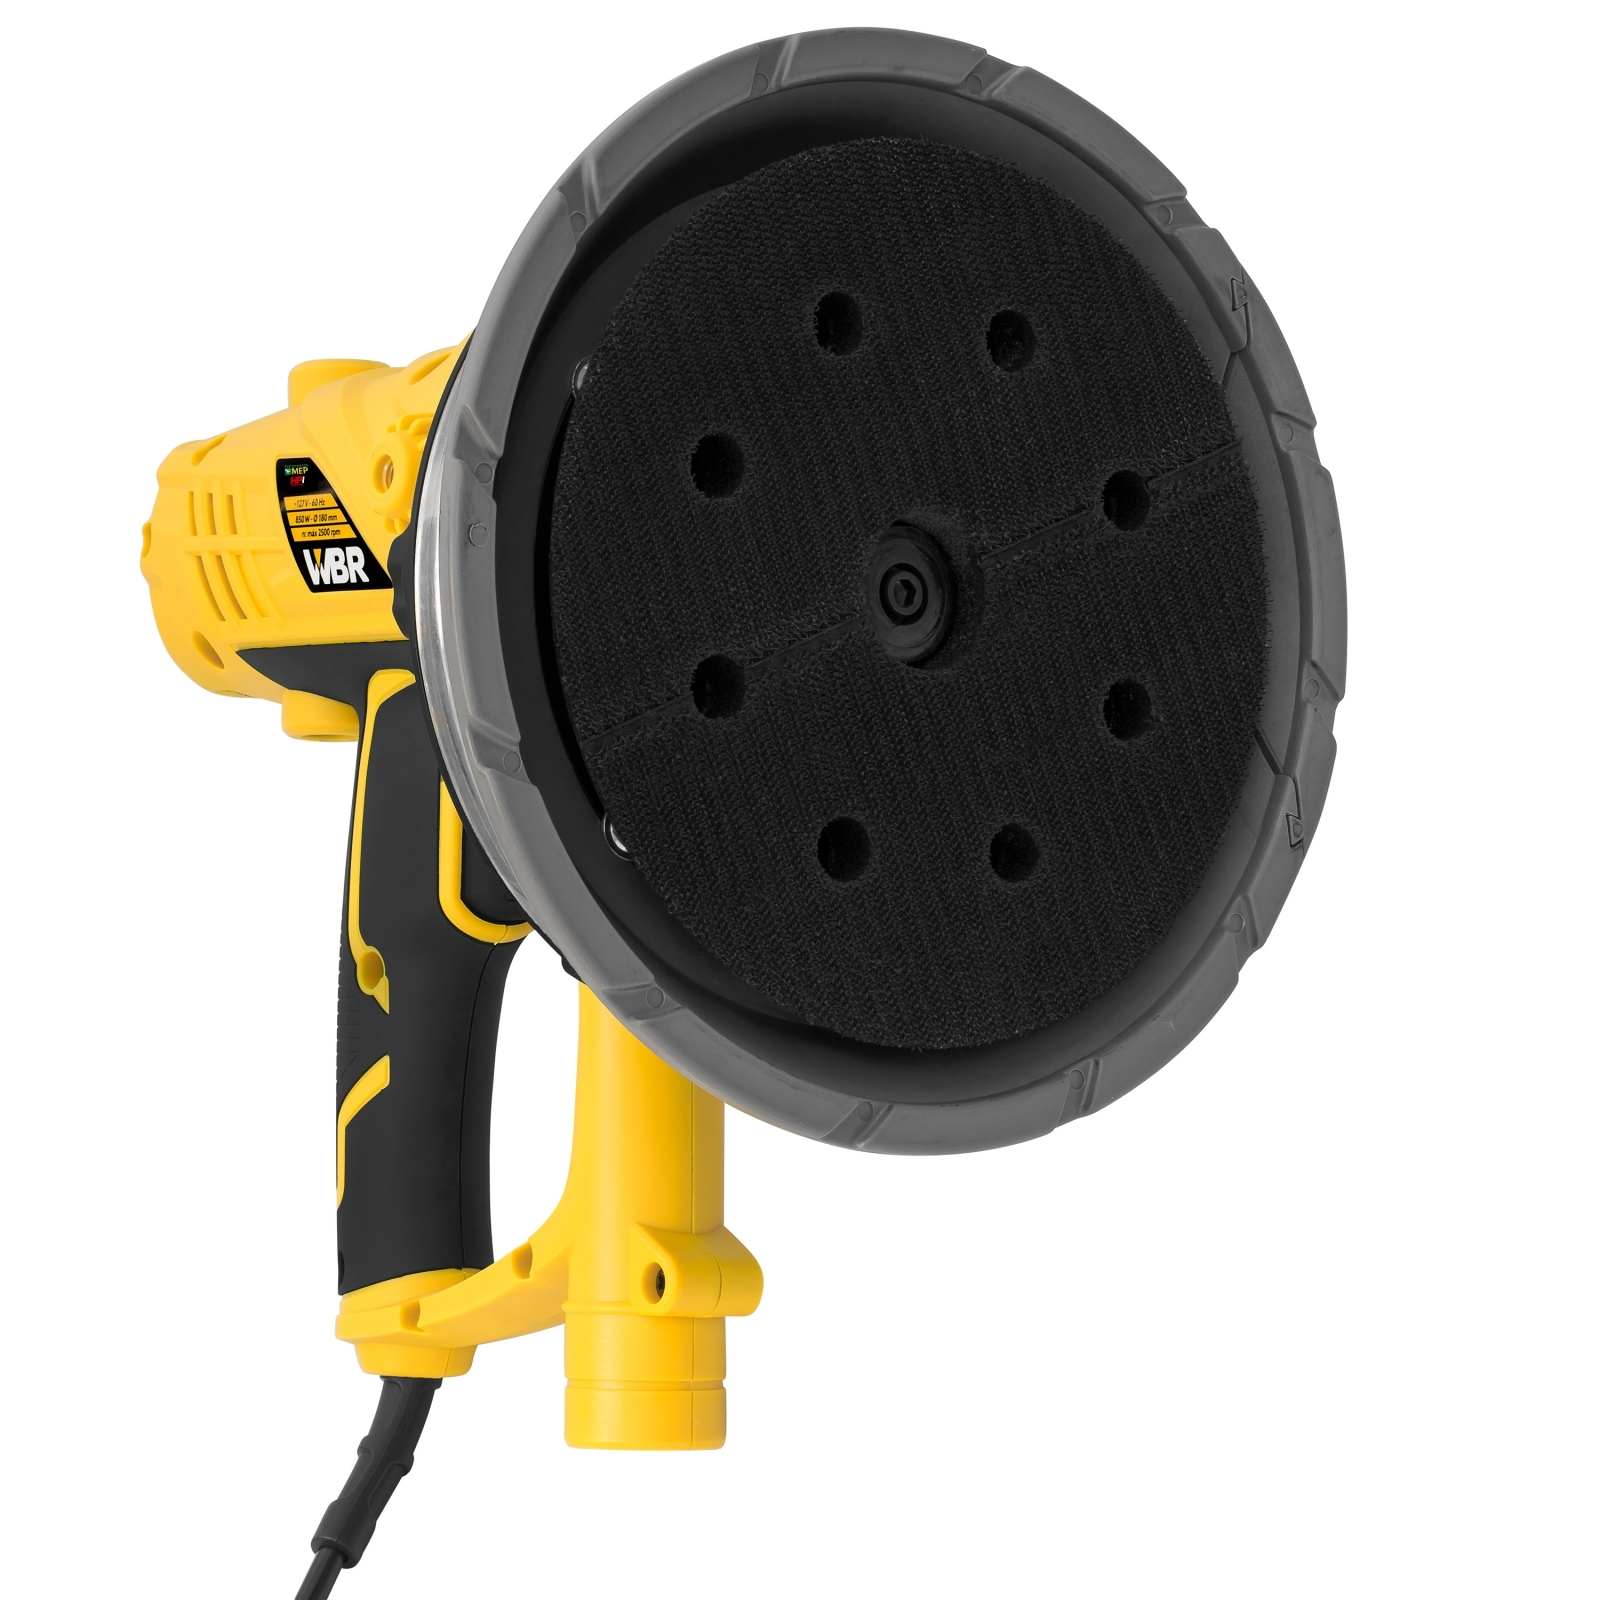 Lixadeira Para Paredes Alvenaria Massa Wagner 850 Watts Lw1 - Ferramentas MEP